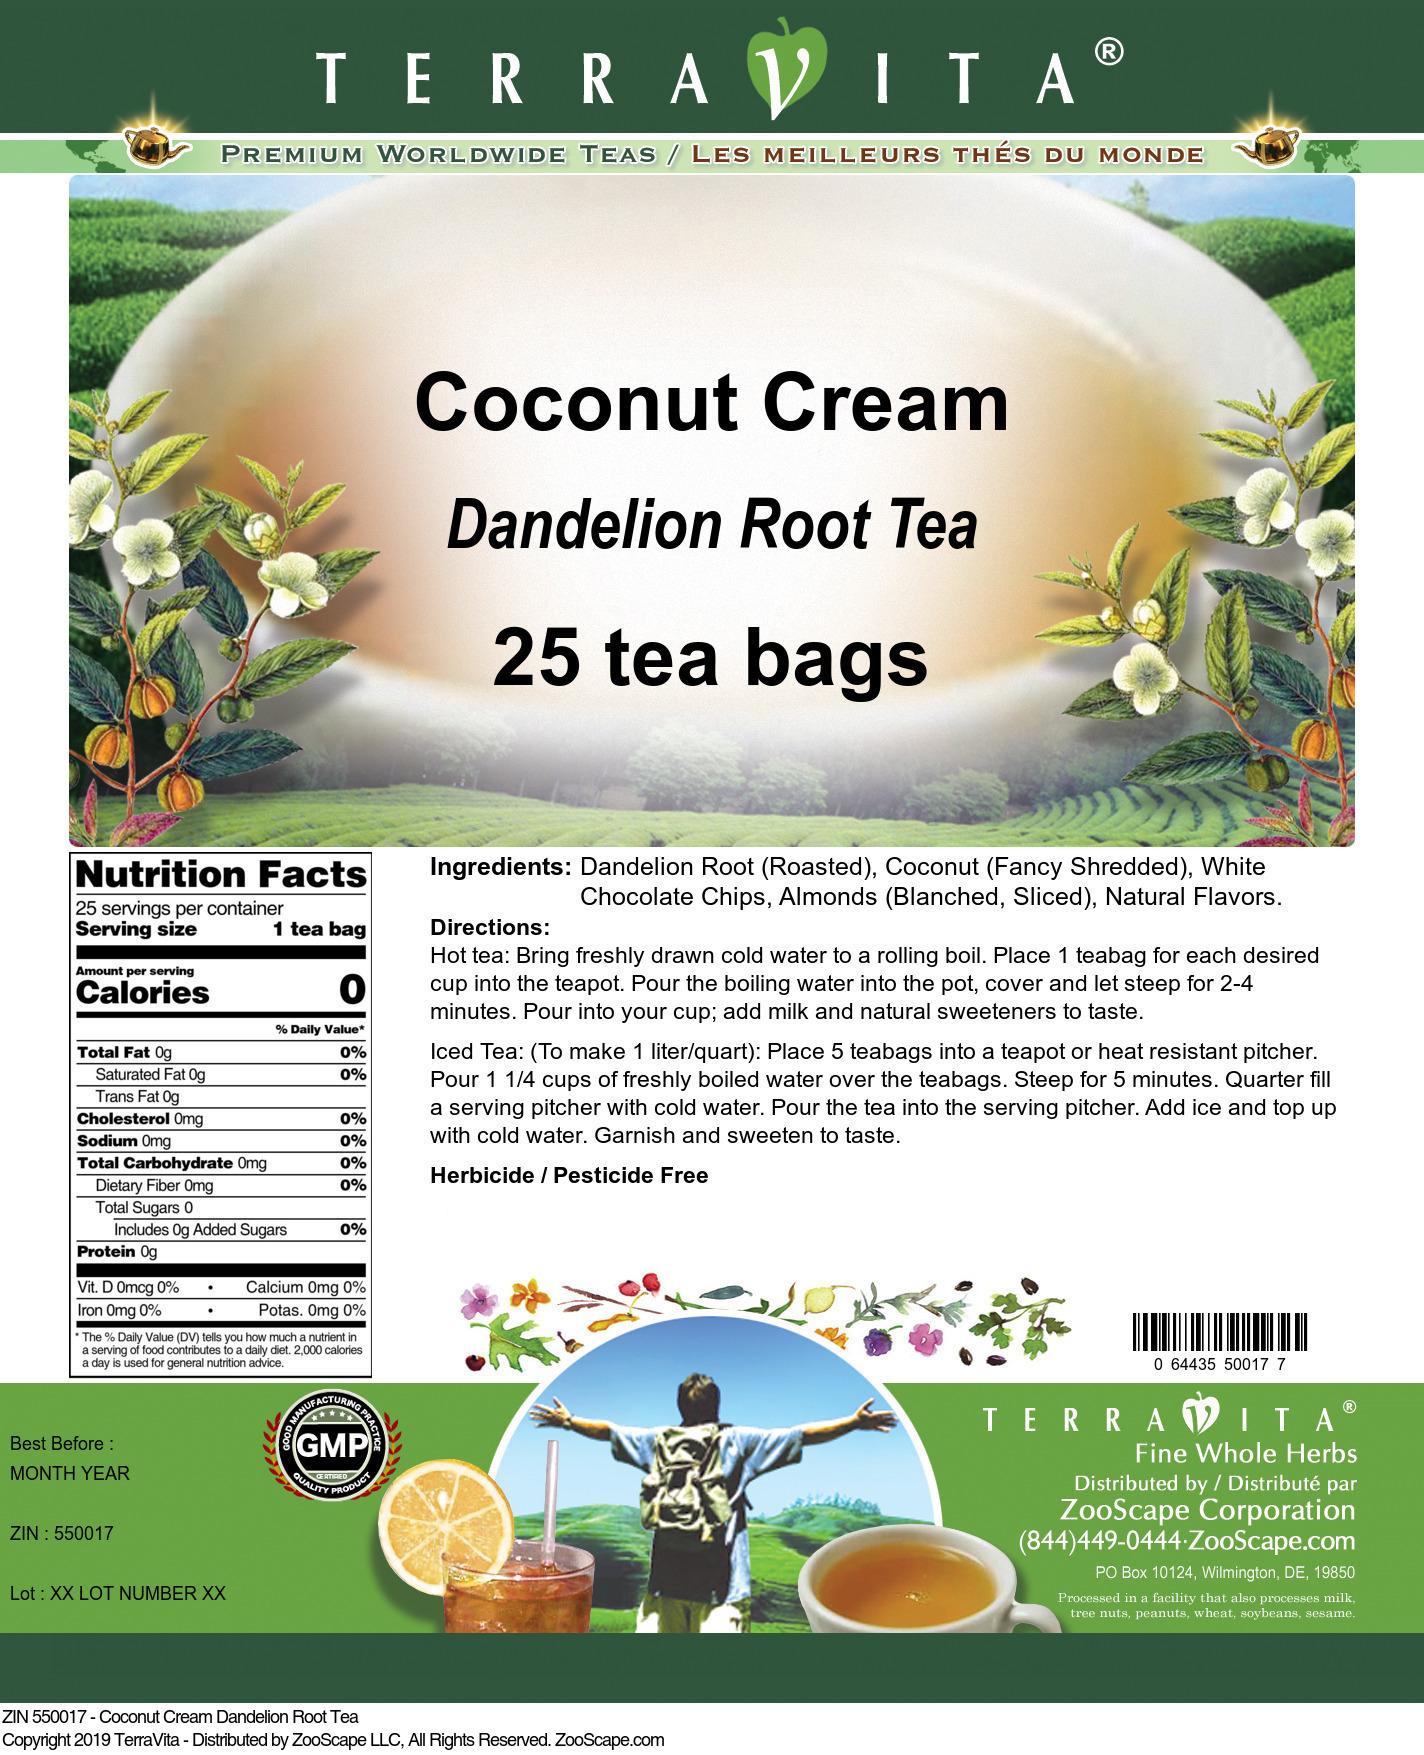 Coconut Cream Dandelion Root Tea